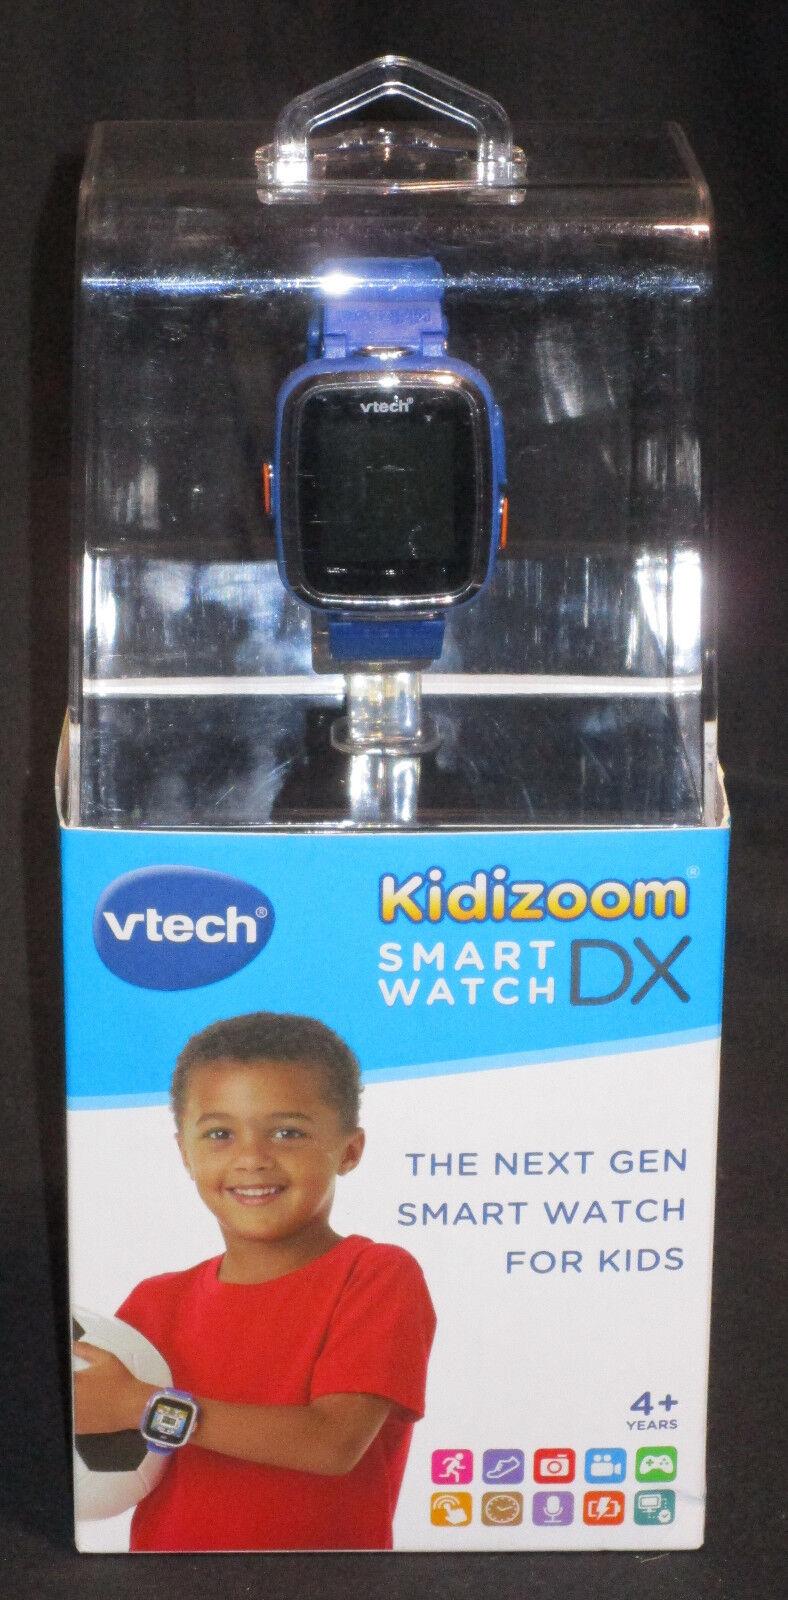 VTech 171603 Kidizoom DX Smart Watch / Armbanduhr für Kinder, Blau ENGLSICH